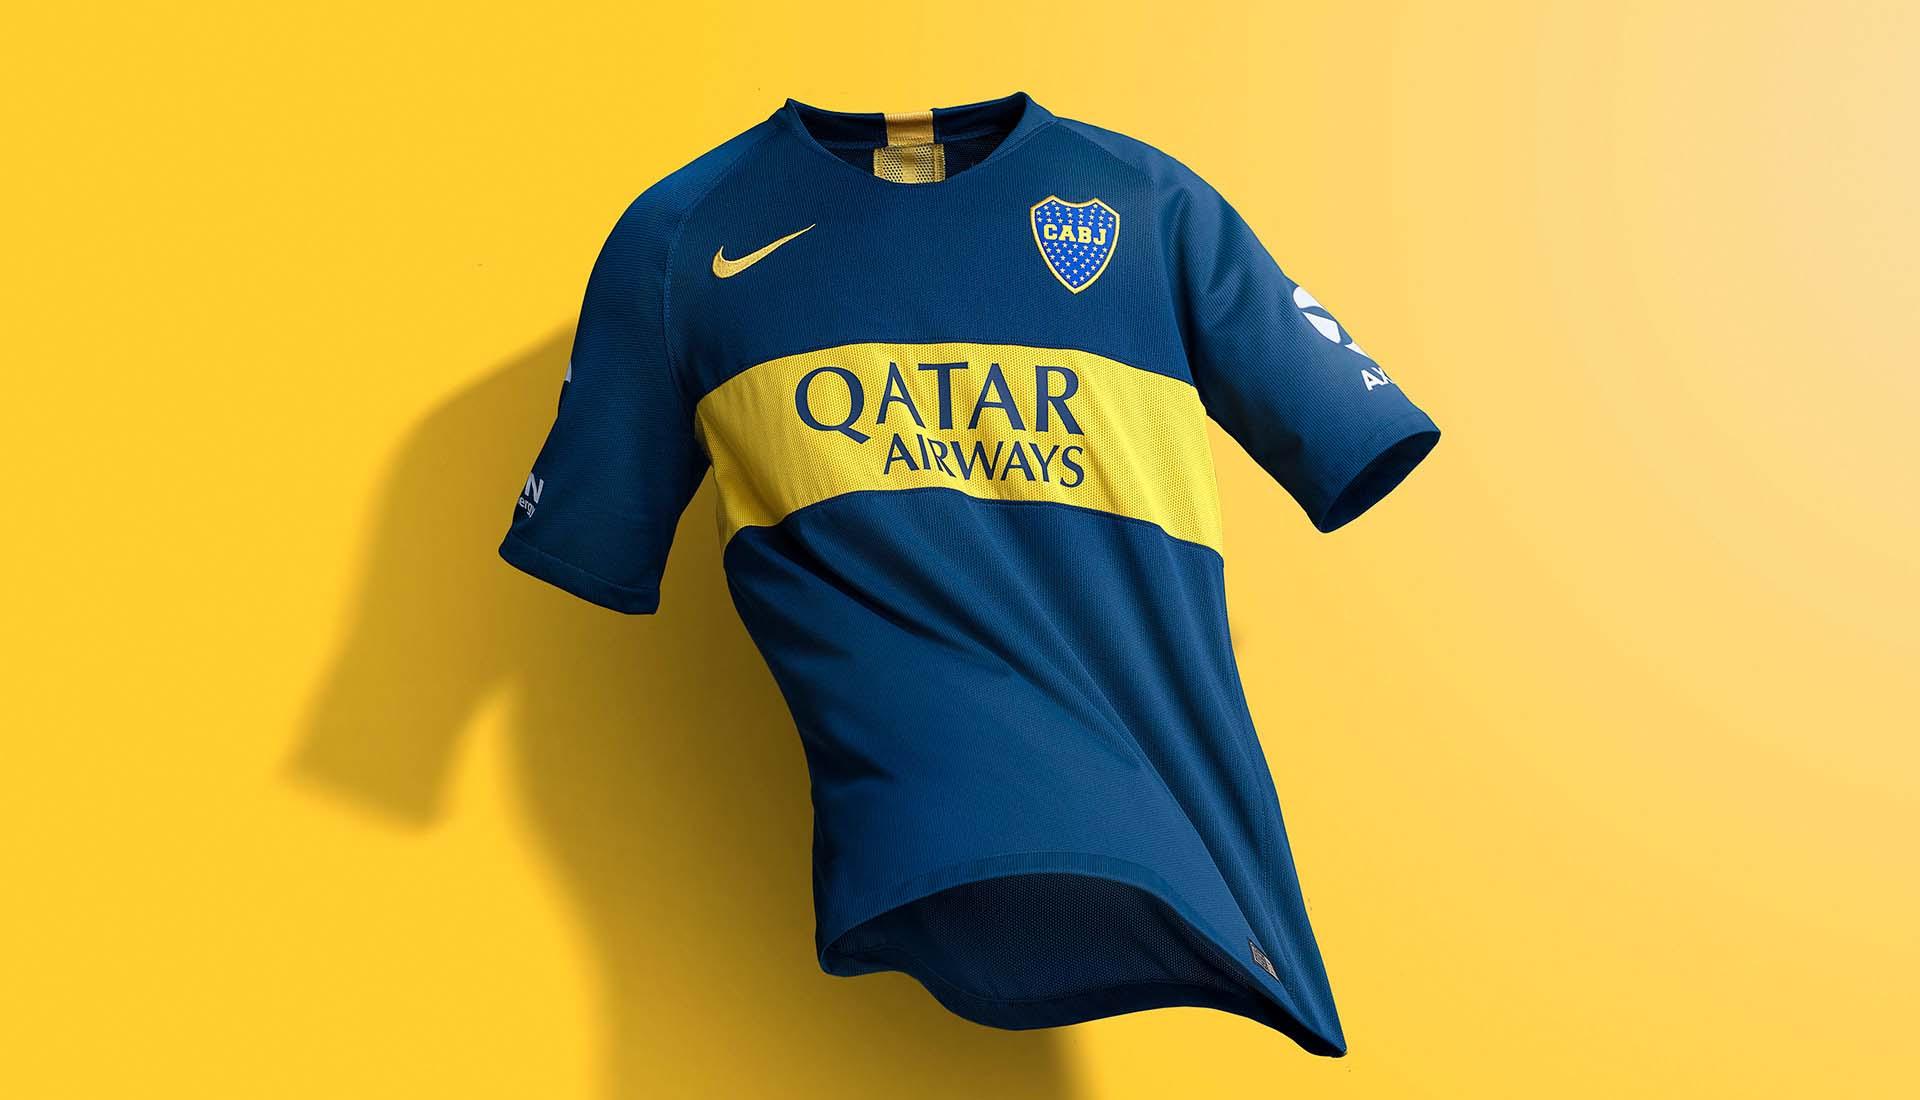 finest selection e70cc 97a30 Nike Launch Boca Juniors 18/19 Home & Away Kits - SoccerBible